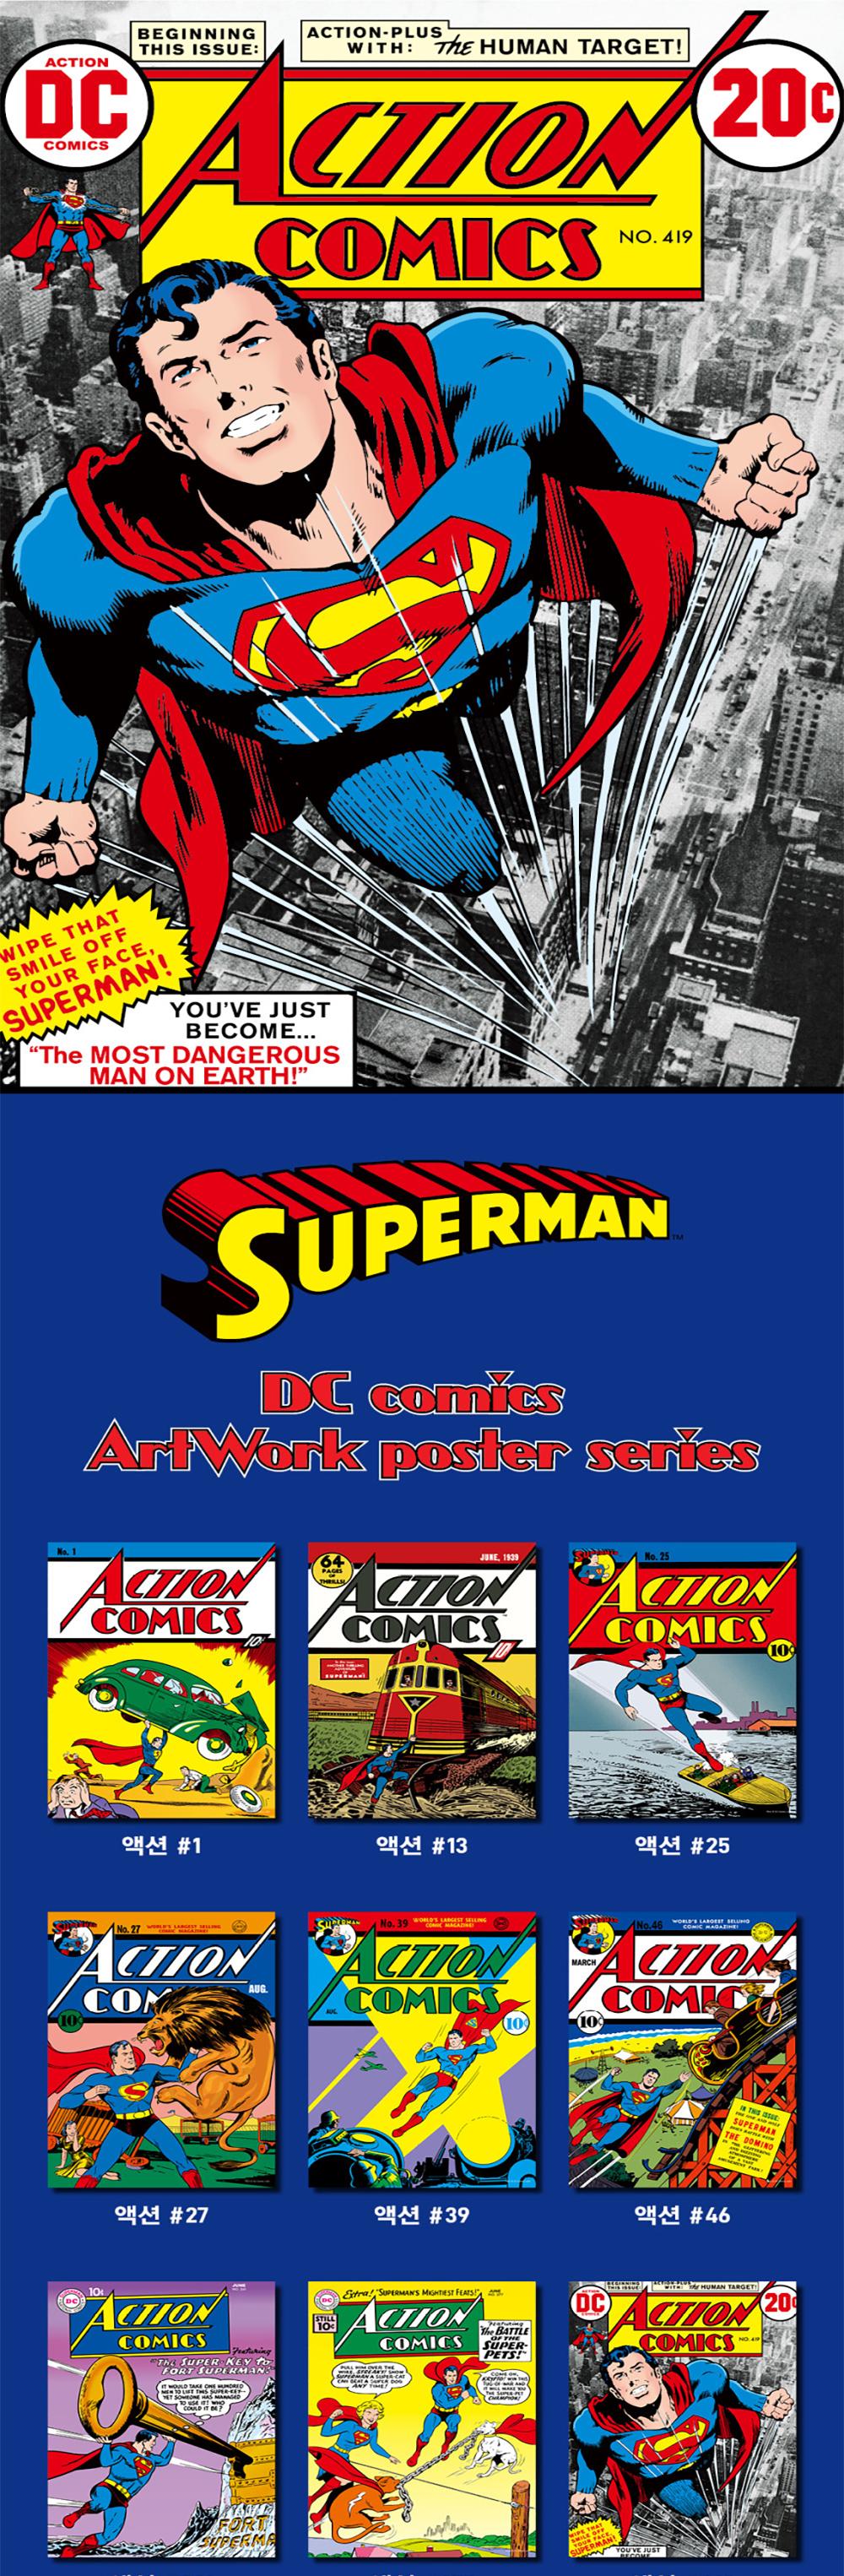 DC코믹스 인테리어 포스터_슈퍼맨_01.jpg